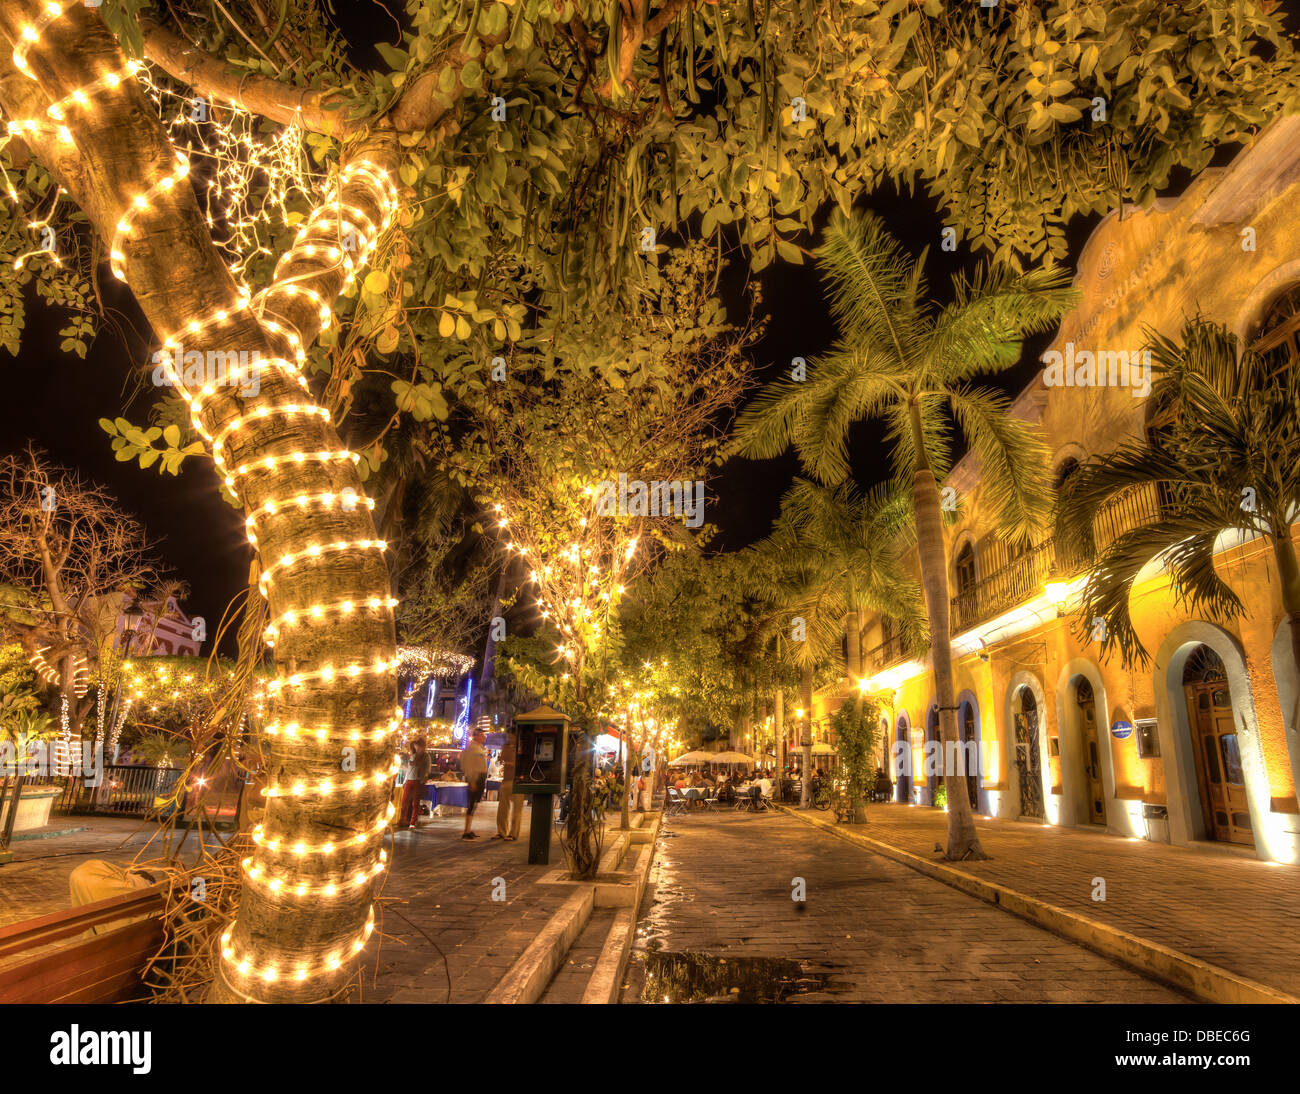 Leuchtet, bringen Sie die Plaza Machado zum Leben in Mazatlan Viejo, Sinaloa, Mexiko. Stockbild